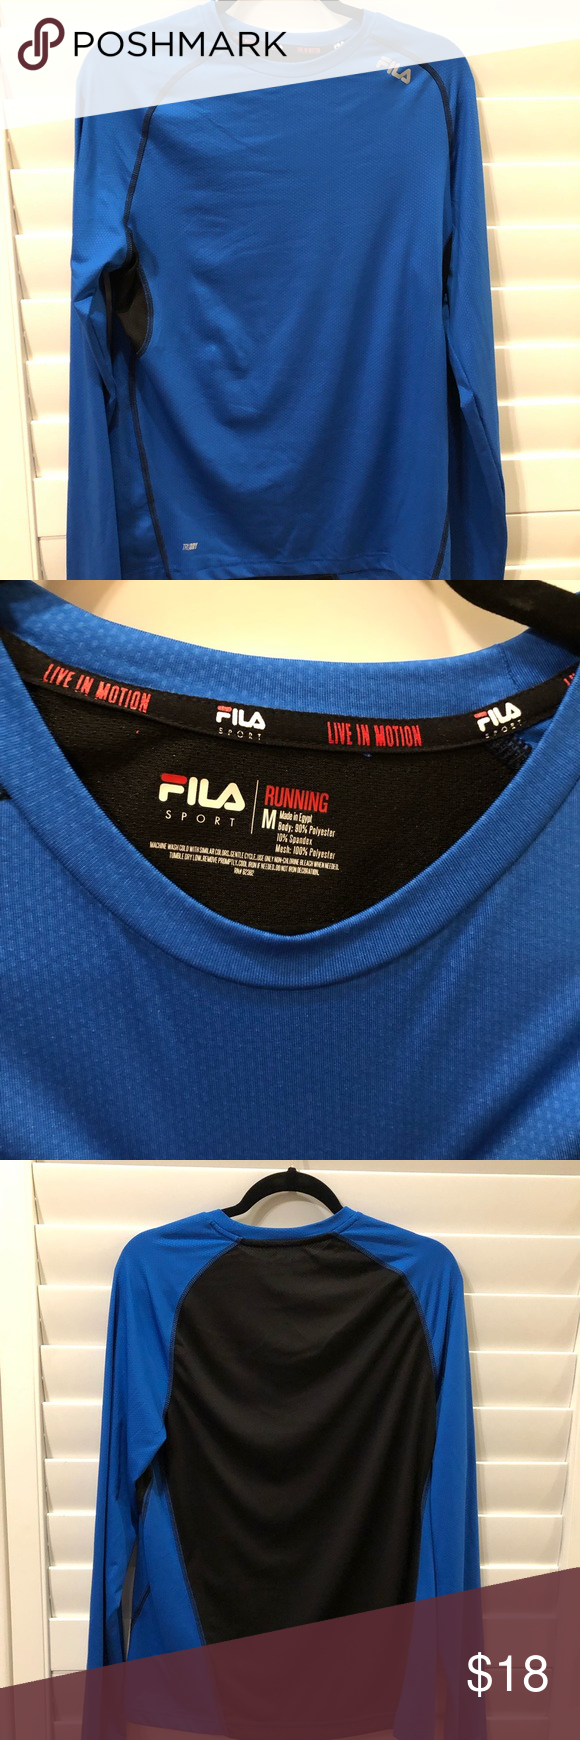 Fila Sport shirt Trydry sports shirt, draws moisture away